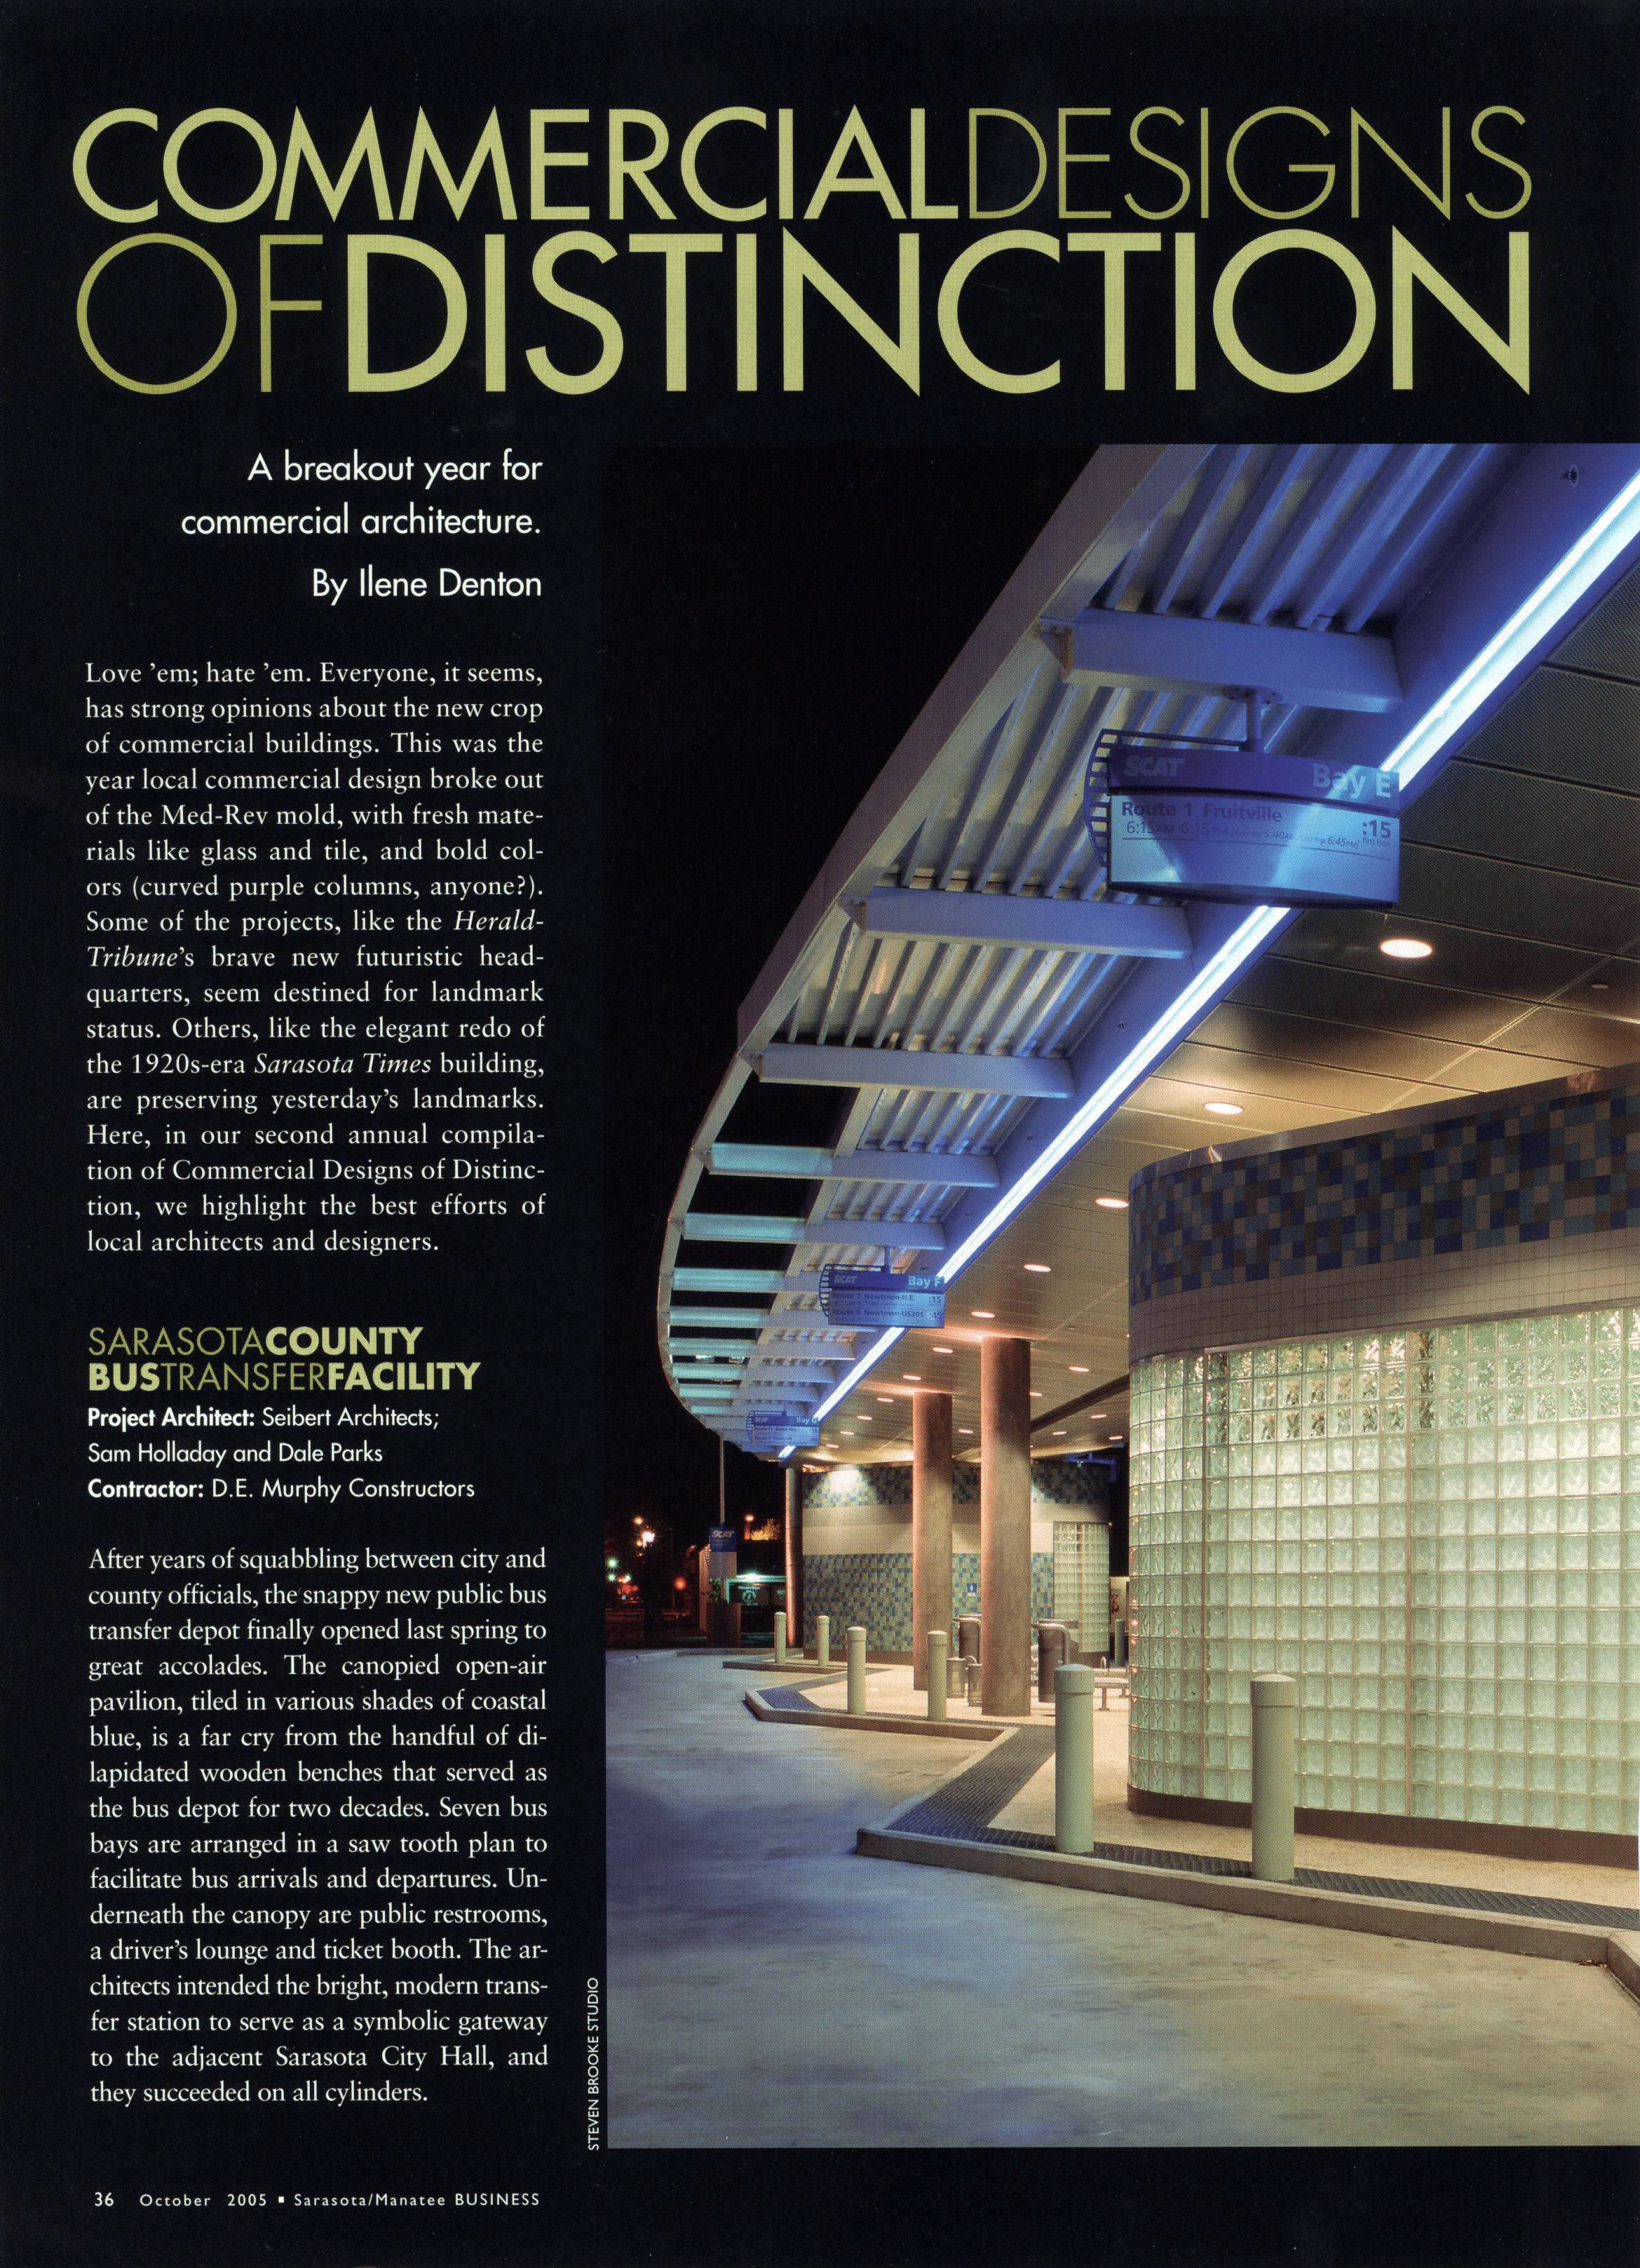 Business 2005 (Publications) 002 SC-5.jpg